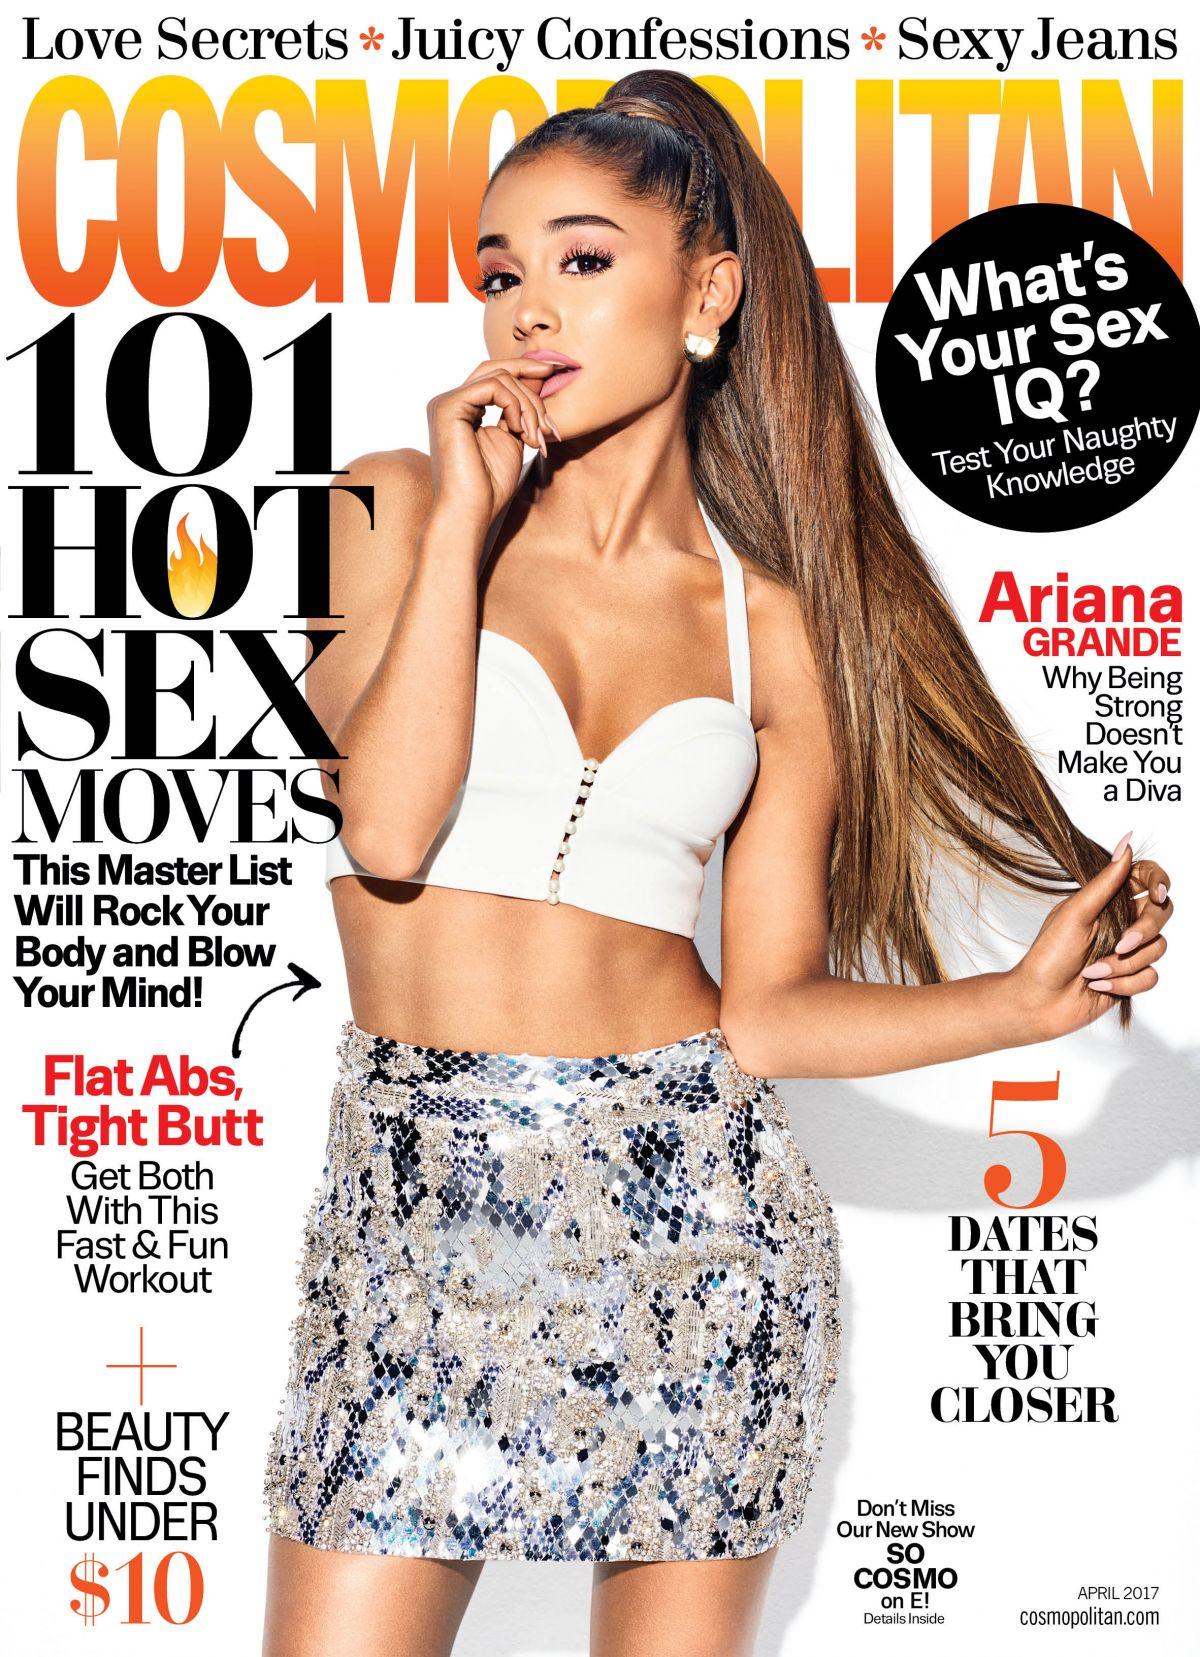 ARIANA GRANDE in Cosmopolitan Magazine, April 2017